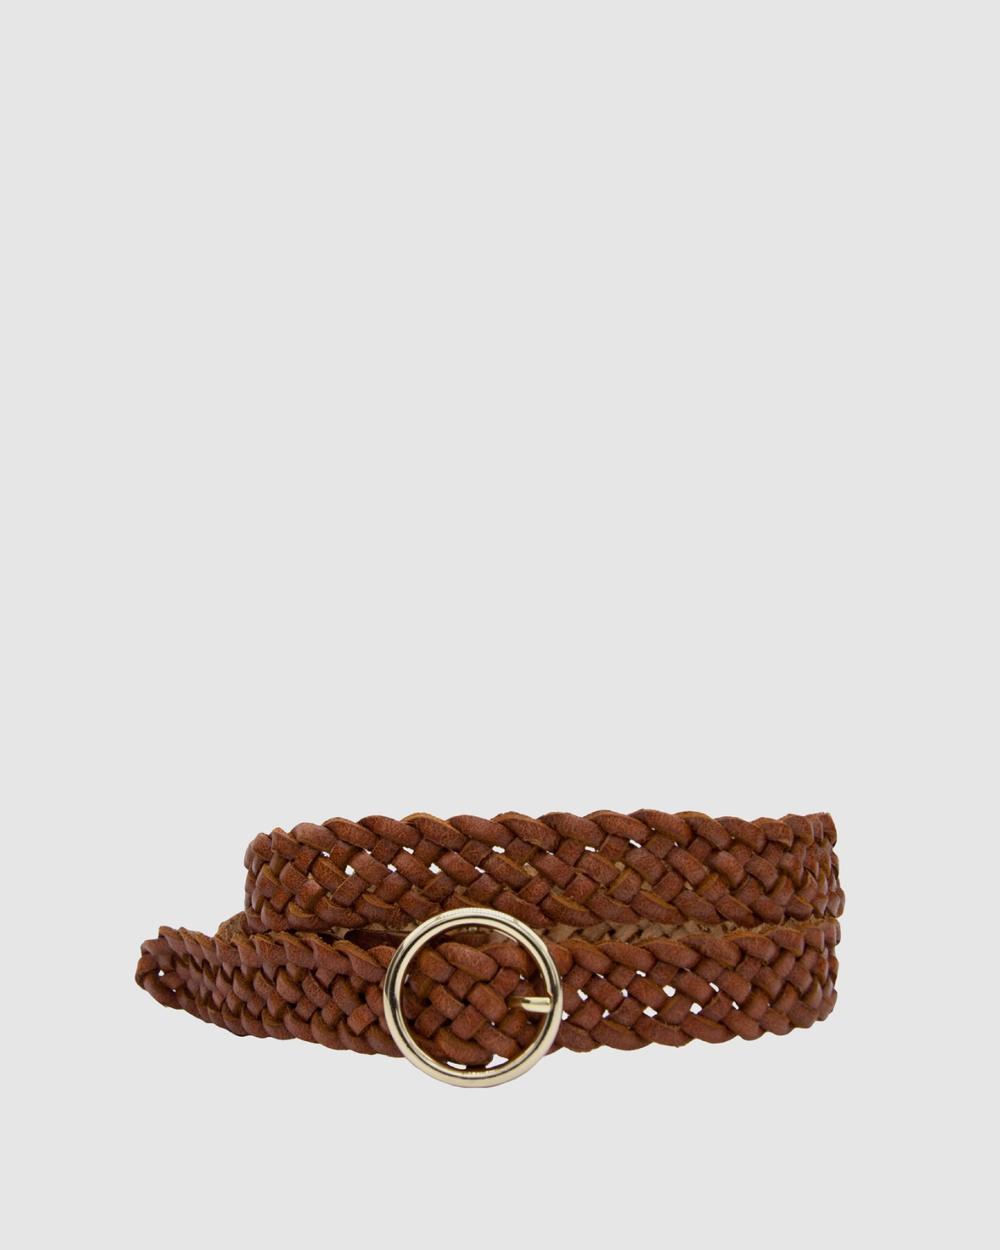 Loop Leather Co Catrina Belts Dark Tan